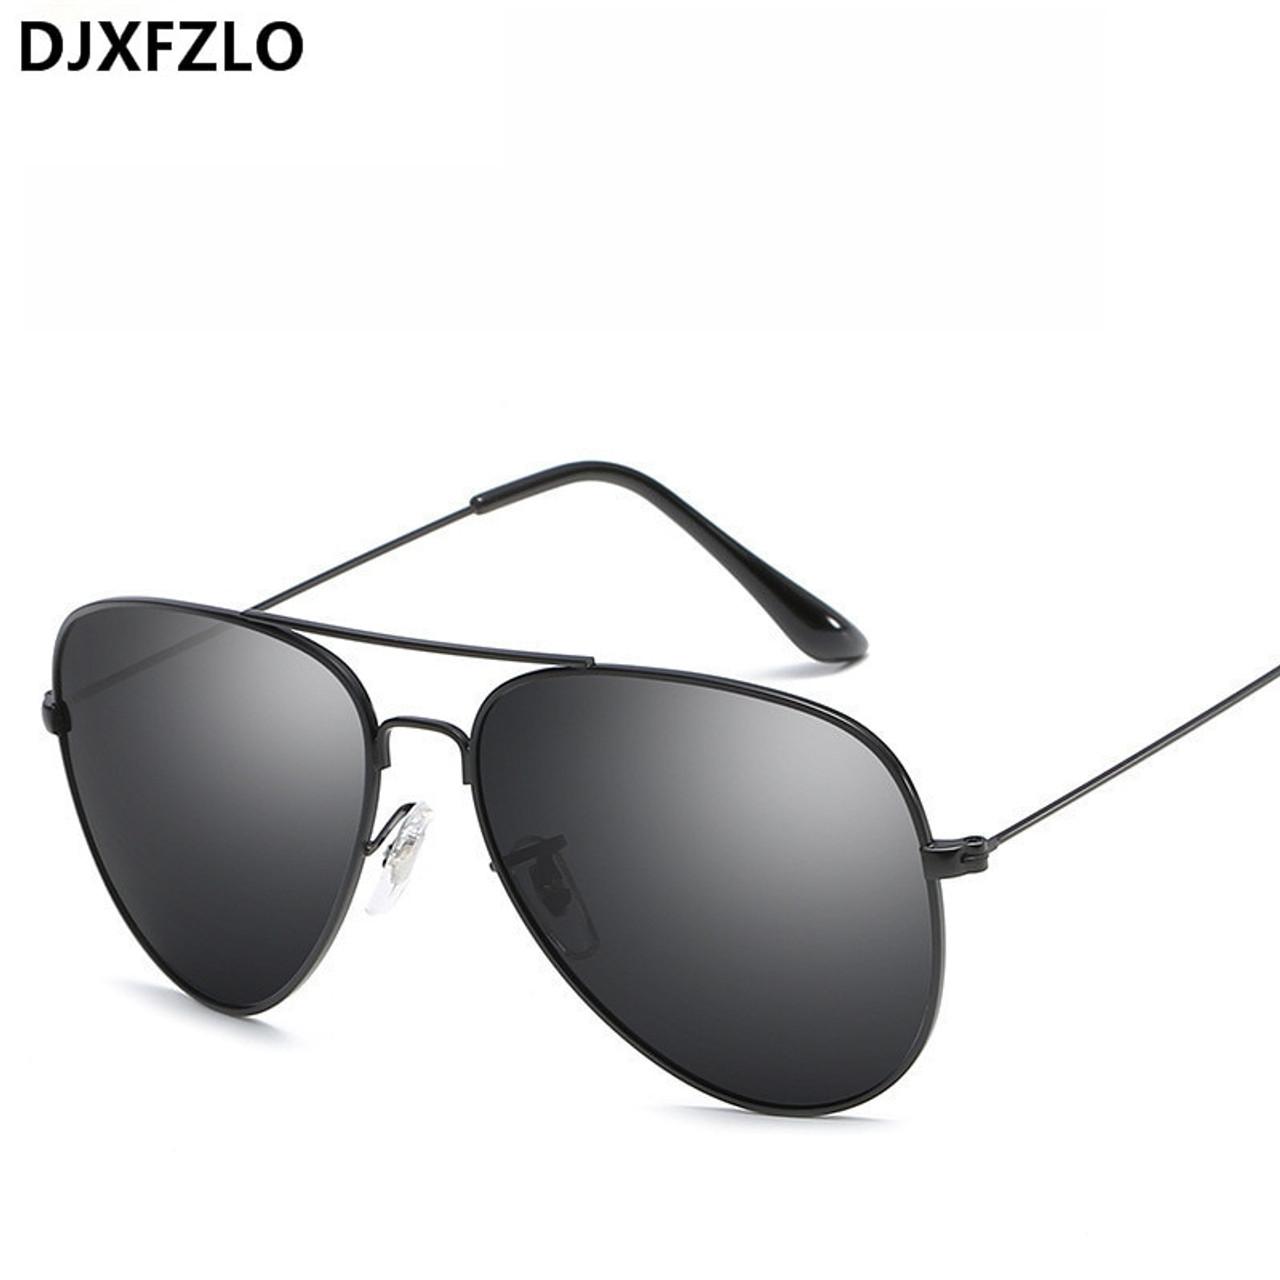 7a04599c7b87 ... DJXFZLO Vintage Classic Sunglasses Women Men Brand Designer Men s Pilot  Driving Mirror Sun Glasses Female Oculos ...